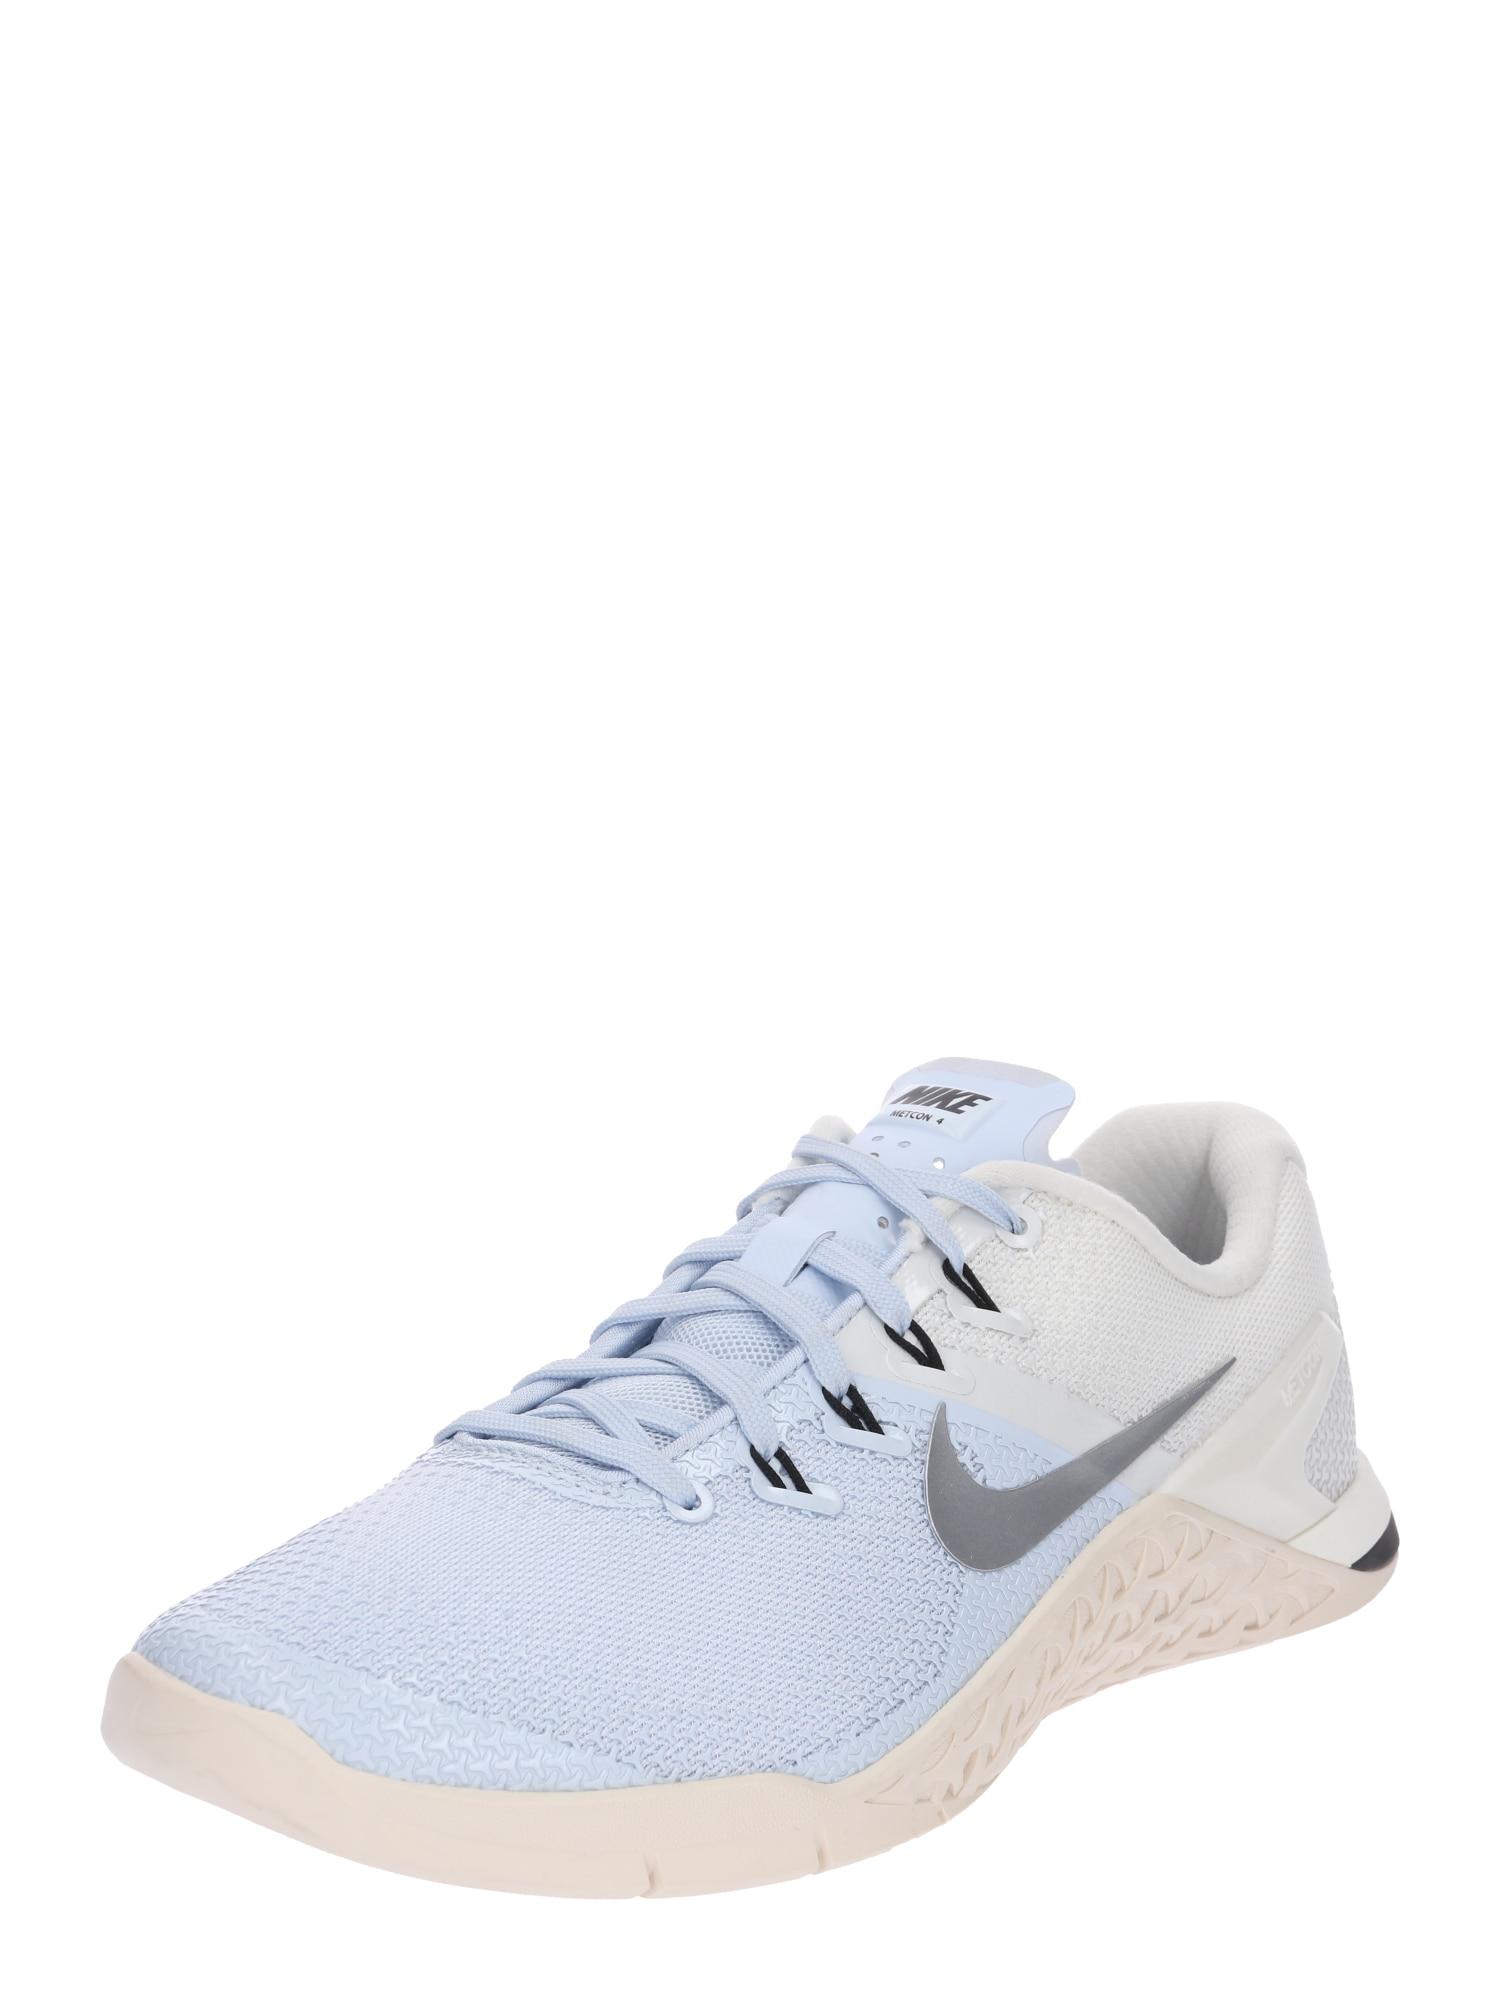 NIKE, Dames Sportschoen 'Nike Metcon 4 XD Metallic', lichtblauw / wit